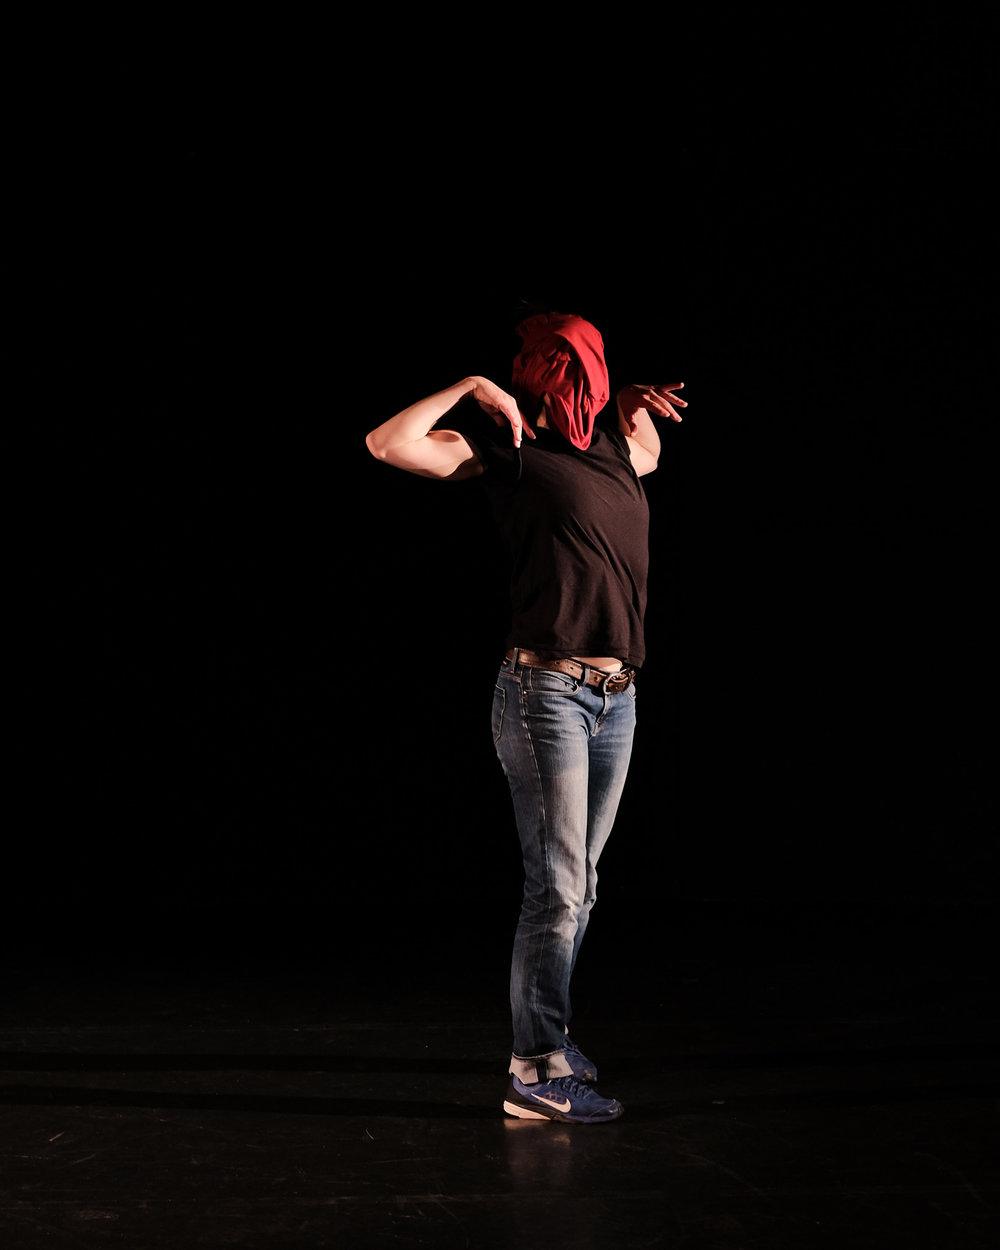 Dance_Halifax_arts_kinetic_liveart_Fox_and_fellow-1.jpg